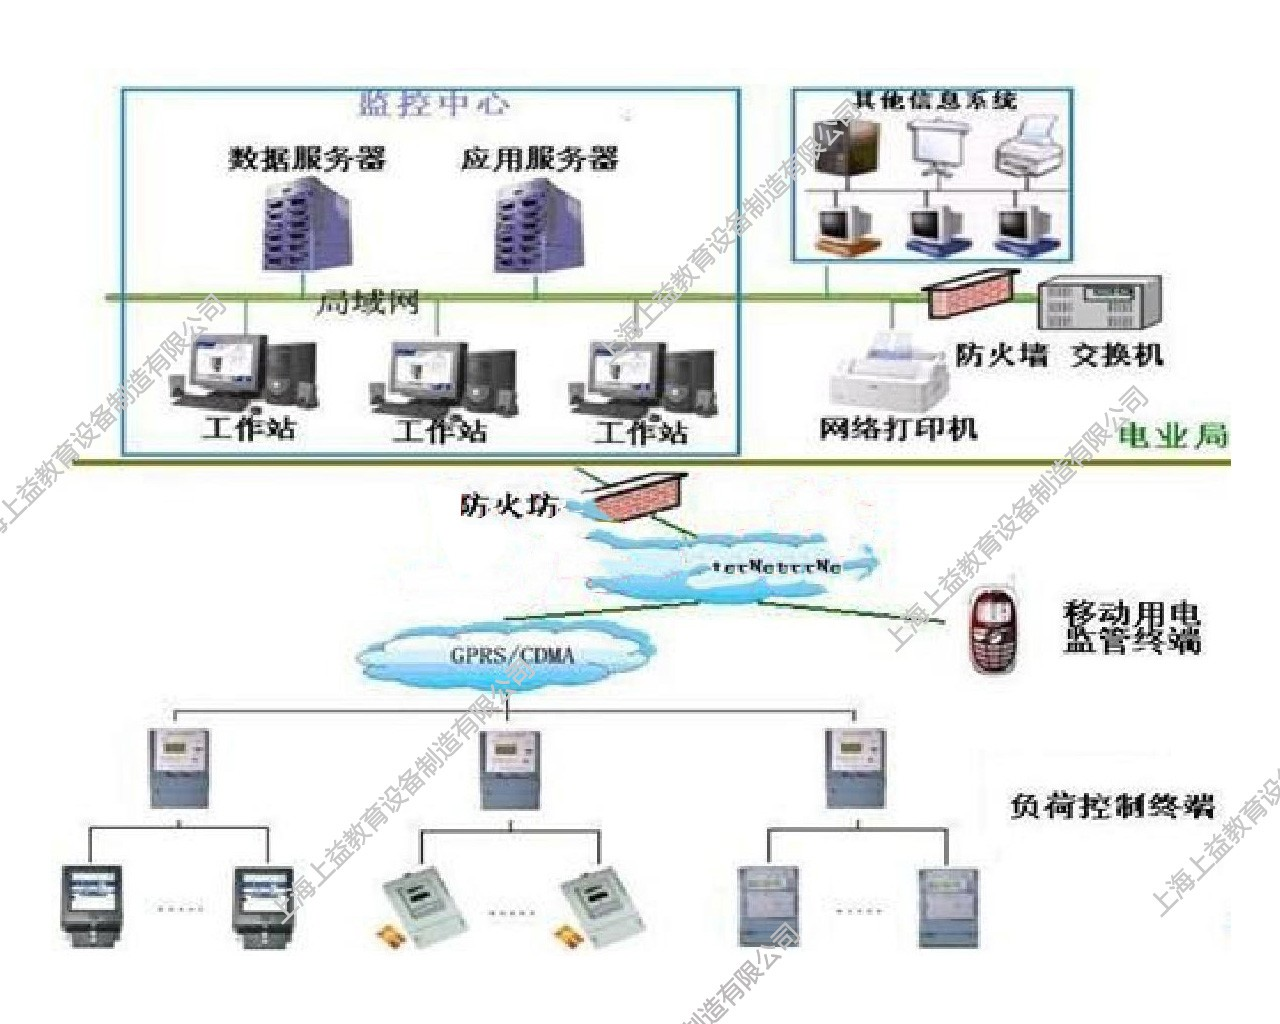 SYDLX-12型电力负荷控制员wwwlehu8vip系统